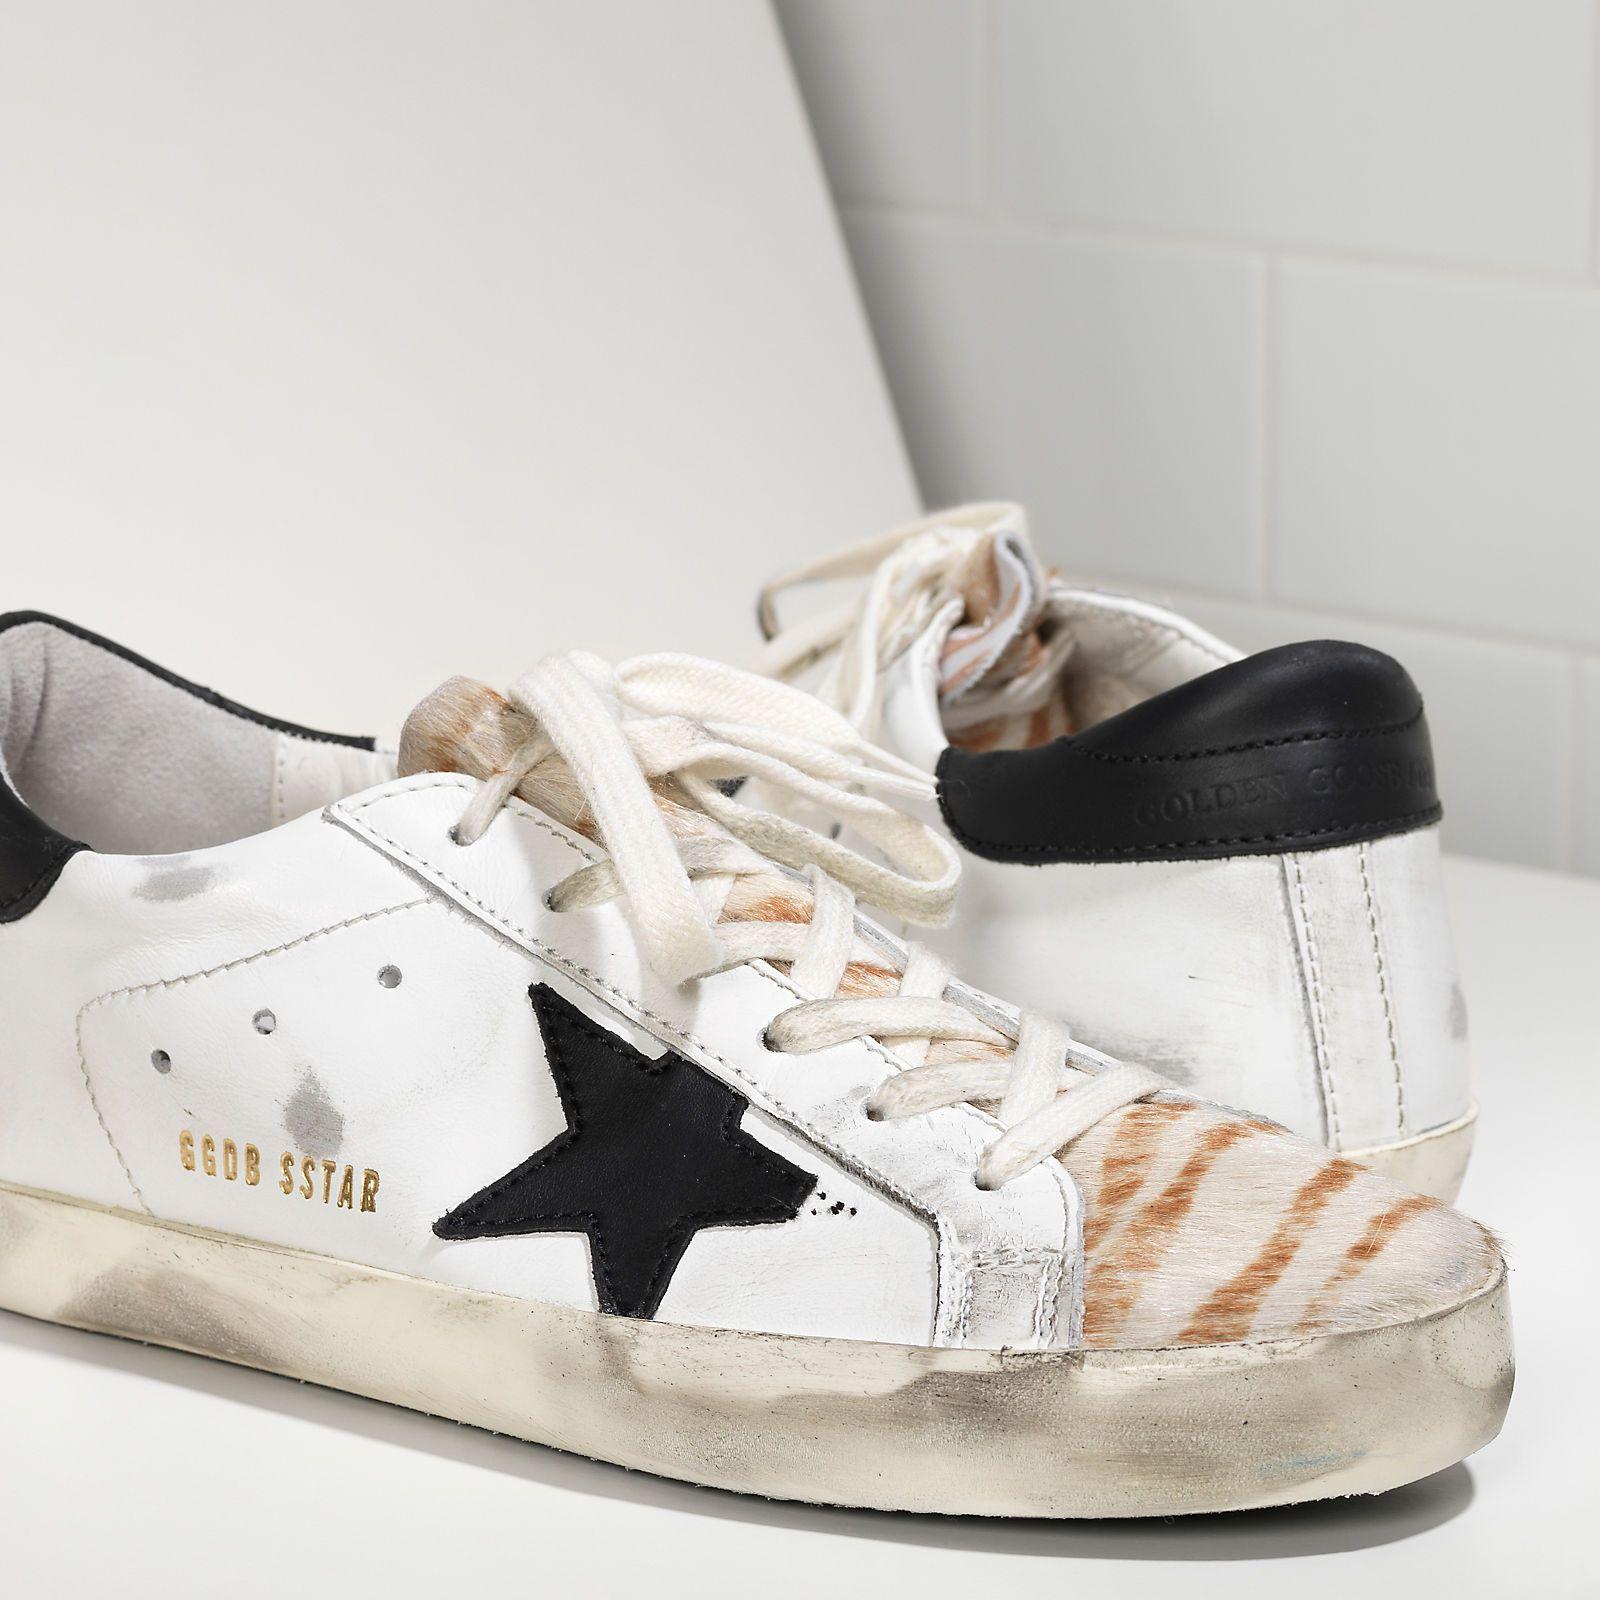 Sneakers SUPER STAR in Pelle e Stella in Pelle - G29WS590.F16 - Golden Goose